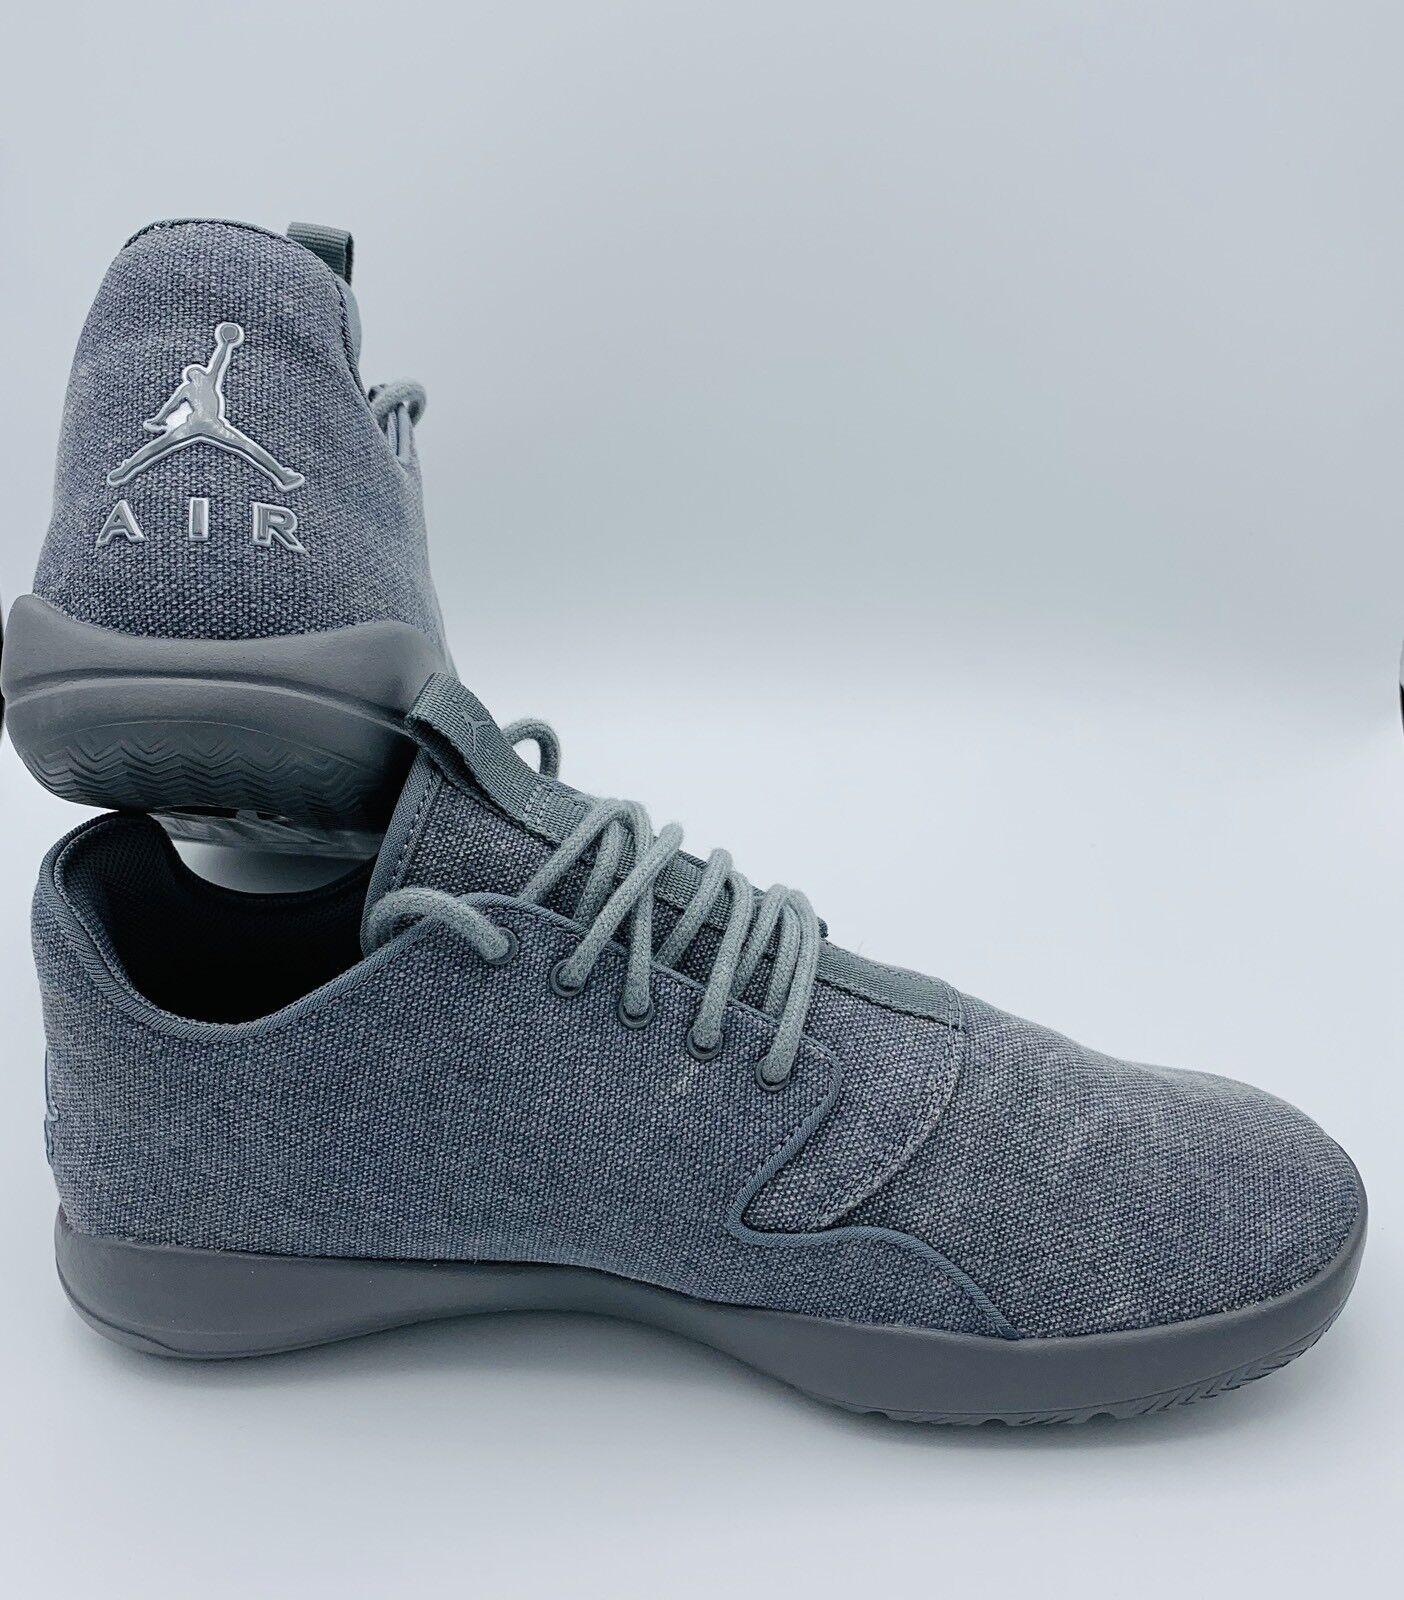 Mens Air Jordan Eclipse Size 8.5 Cool Grey Mesh 724010-024